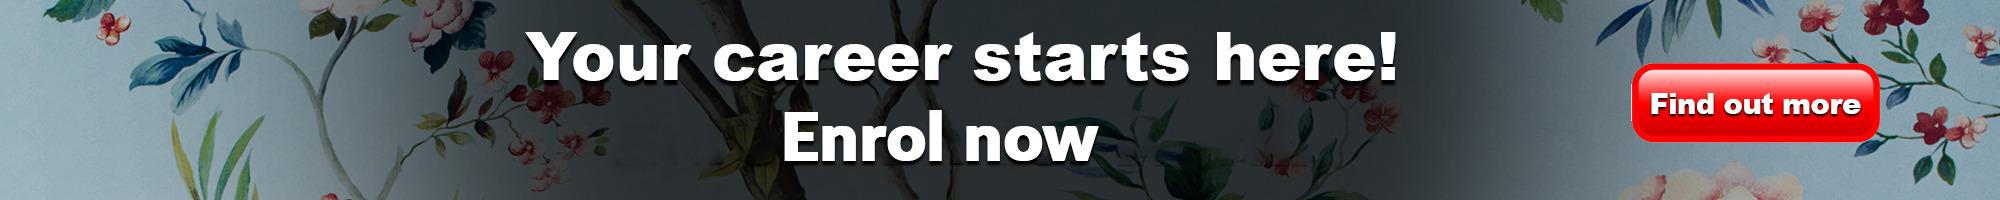 enrol-now-october